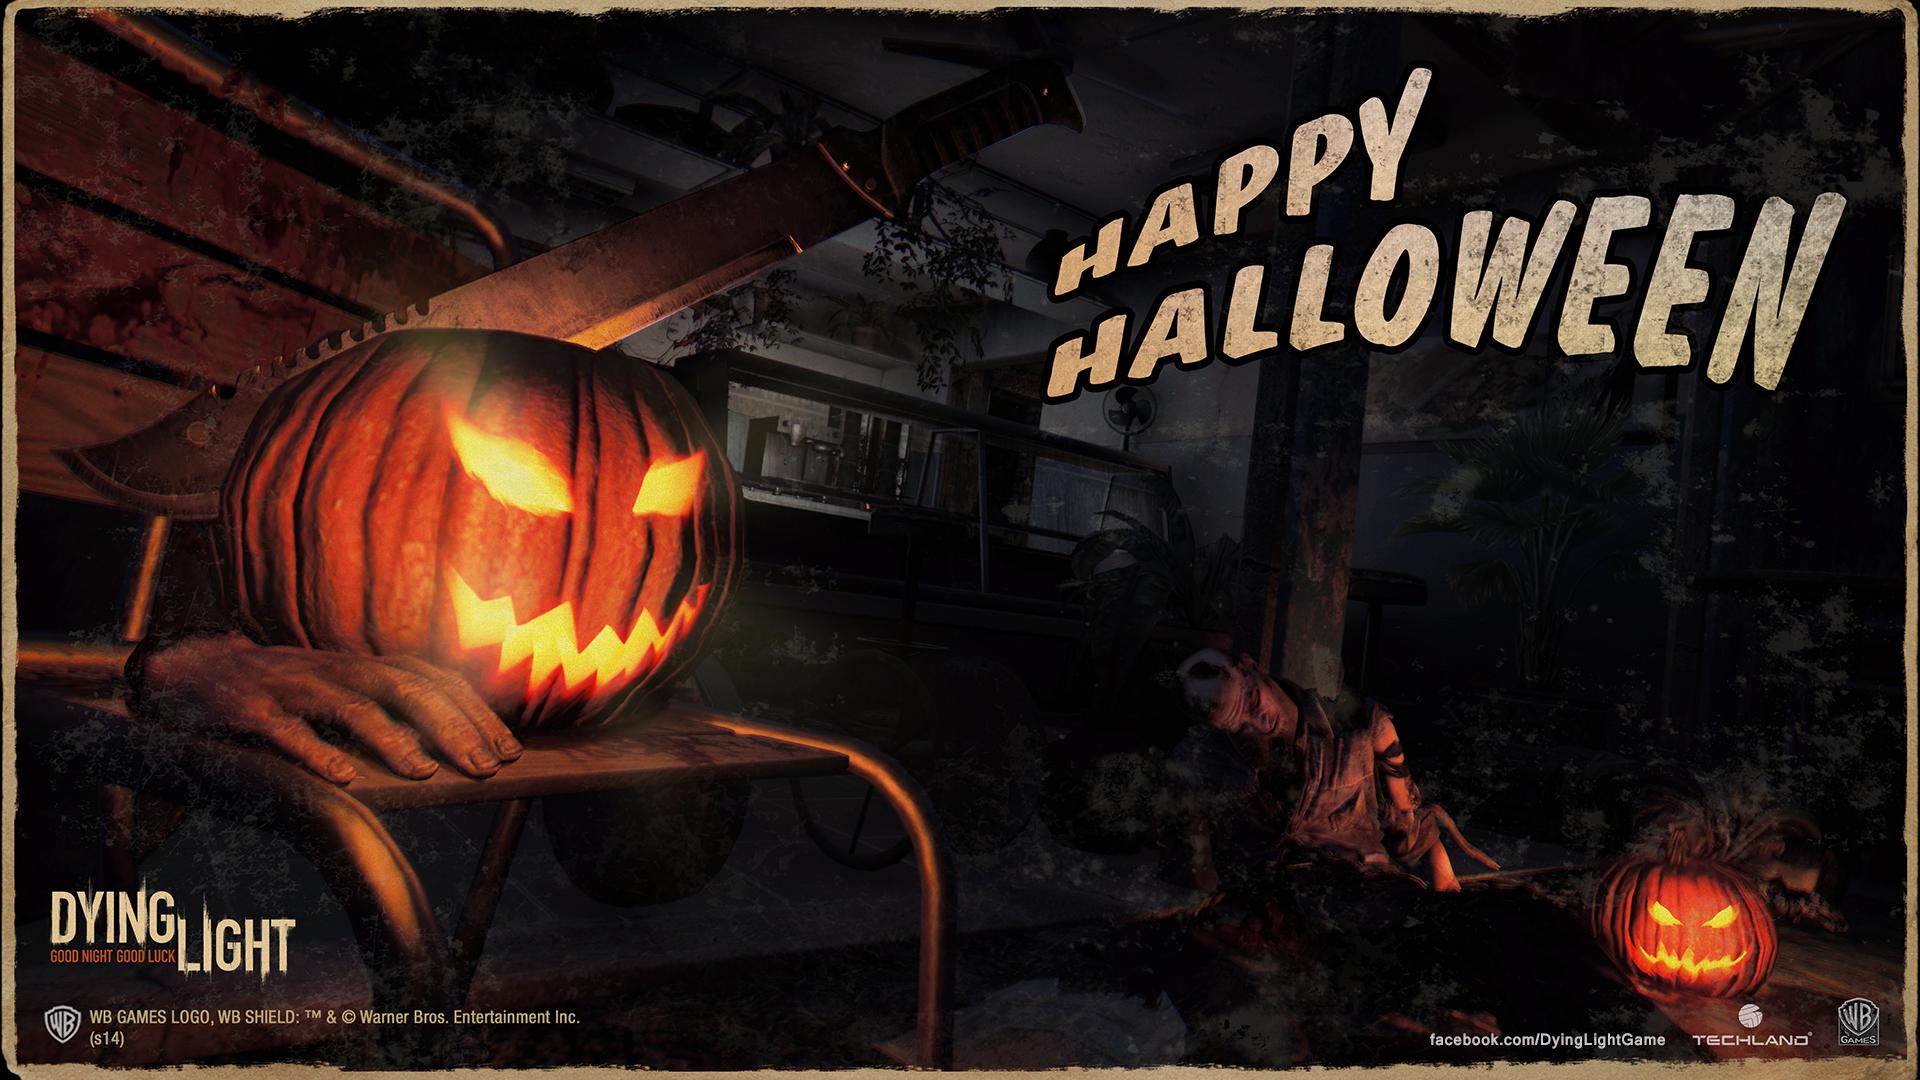 Beautiful Wallpaper Halloween Light - DL_Halloween_01  Image_218299.png